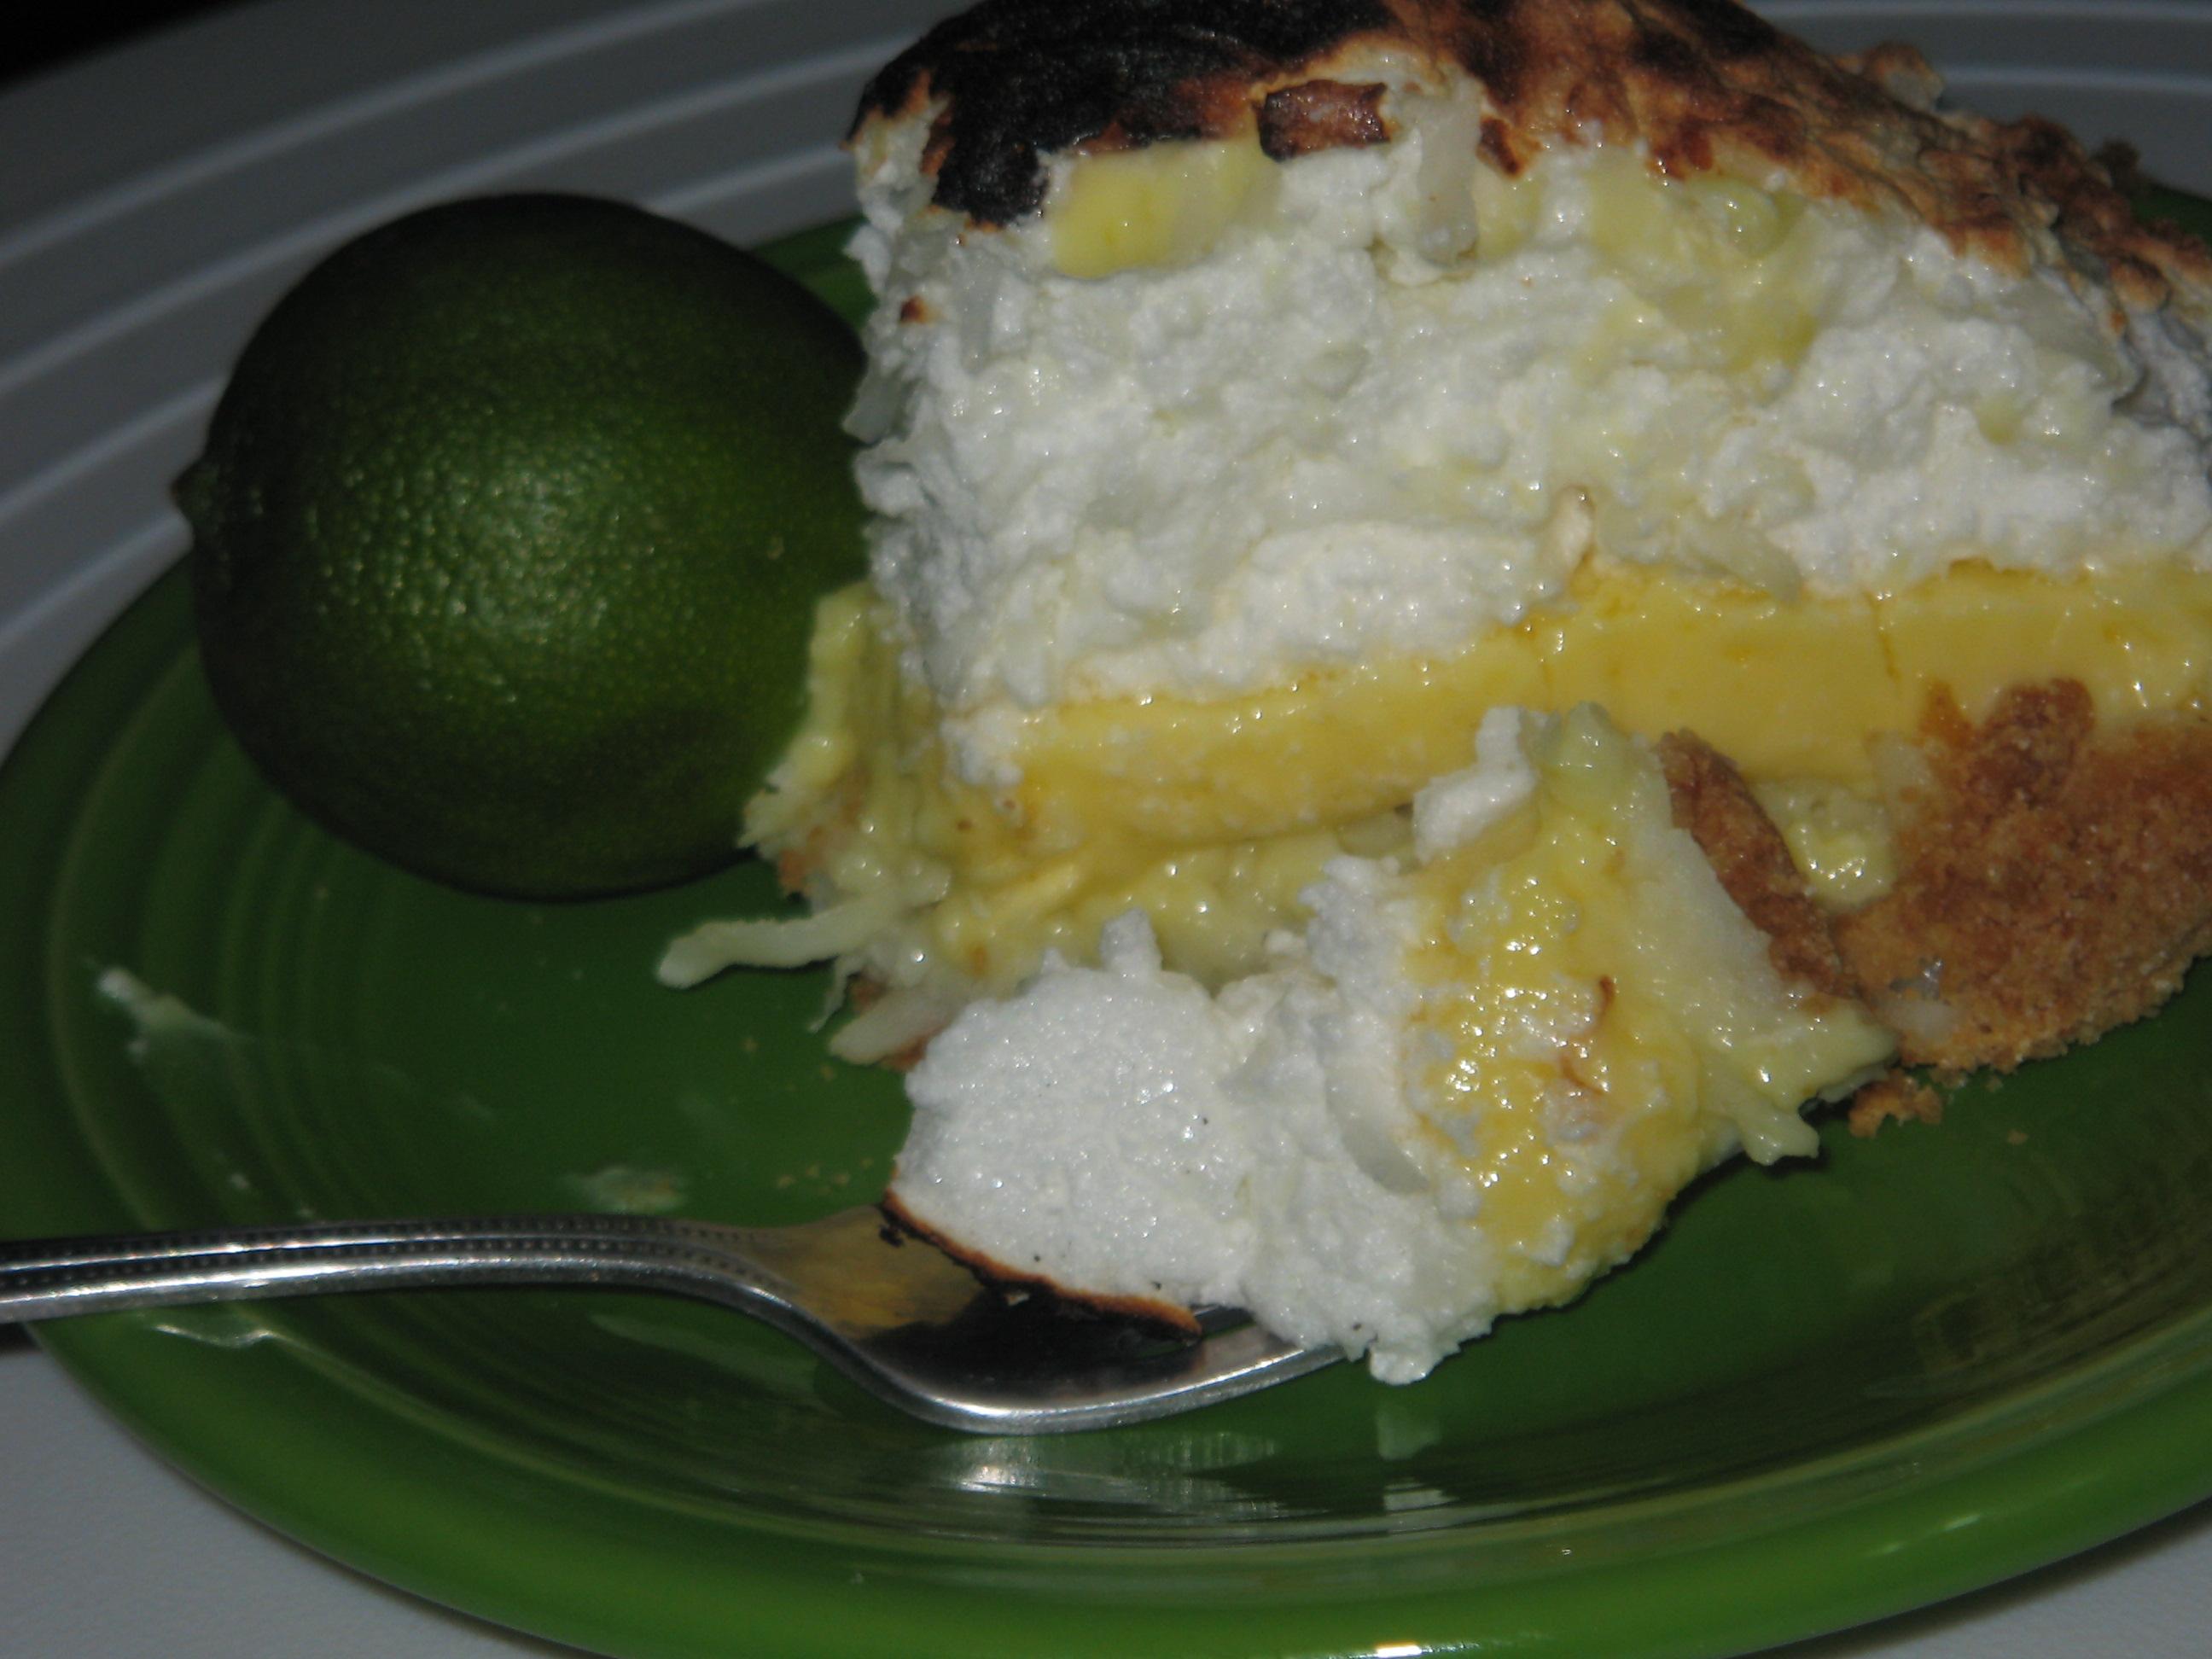 Coconut Key Lime Pie slice